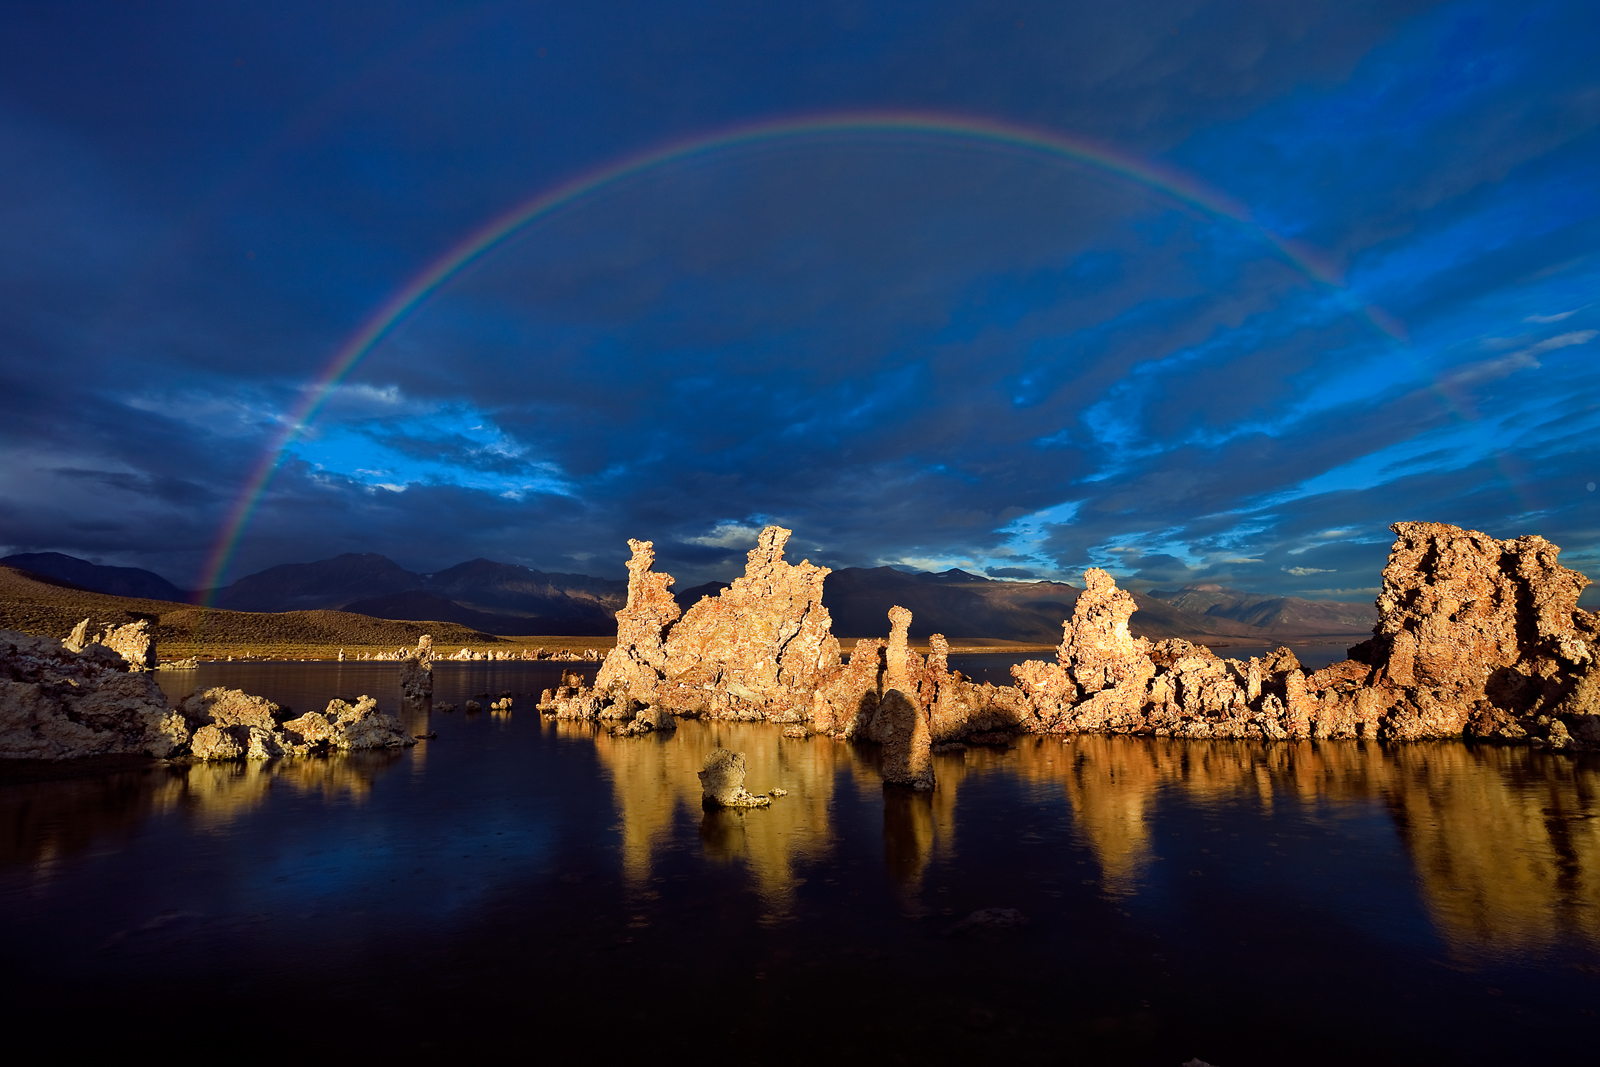 Photo Of The Day By Paul Bredow - Digital Photo Magazine